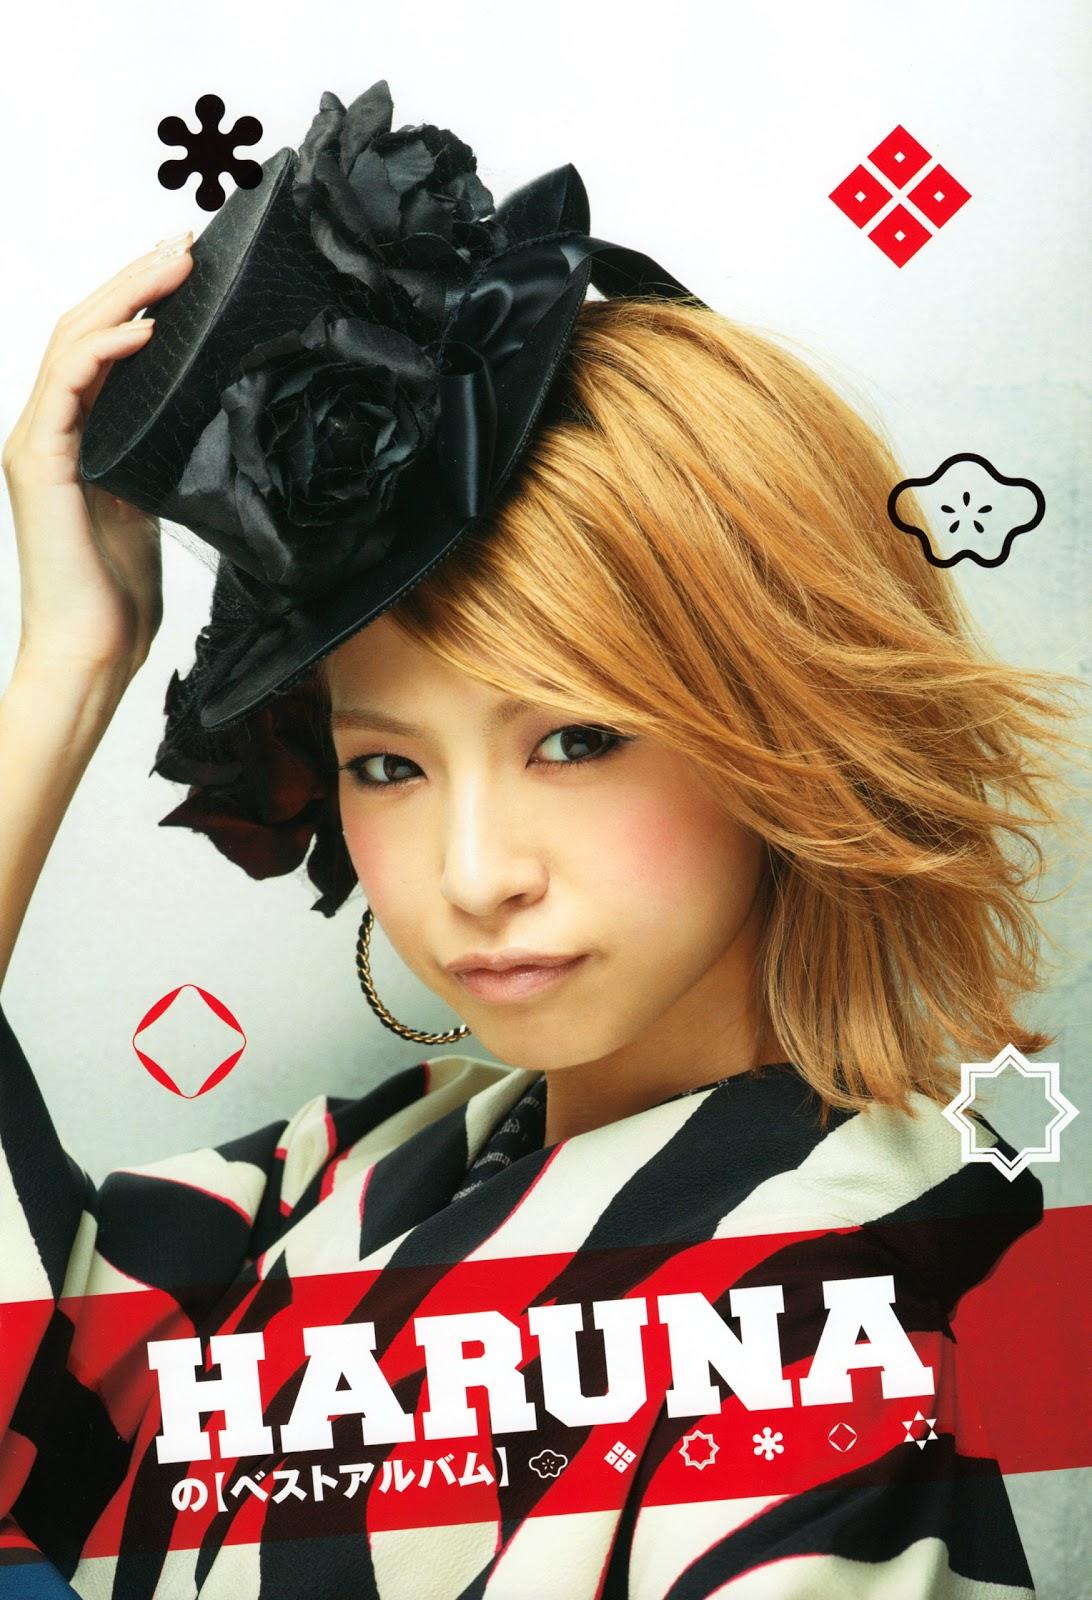 Haruna SCANDAL Show PB High Resolution